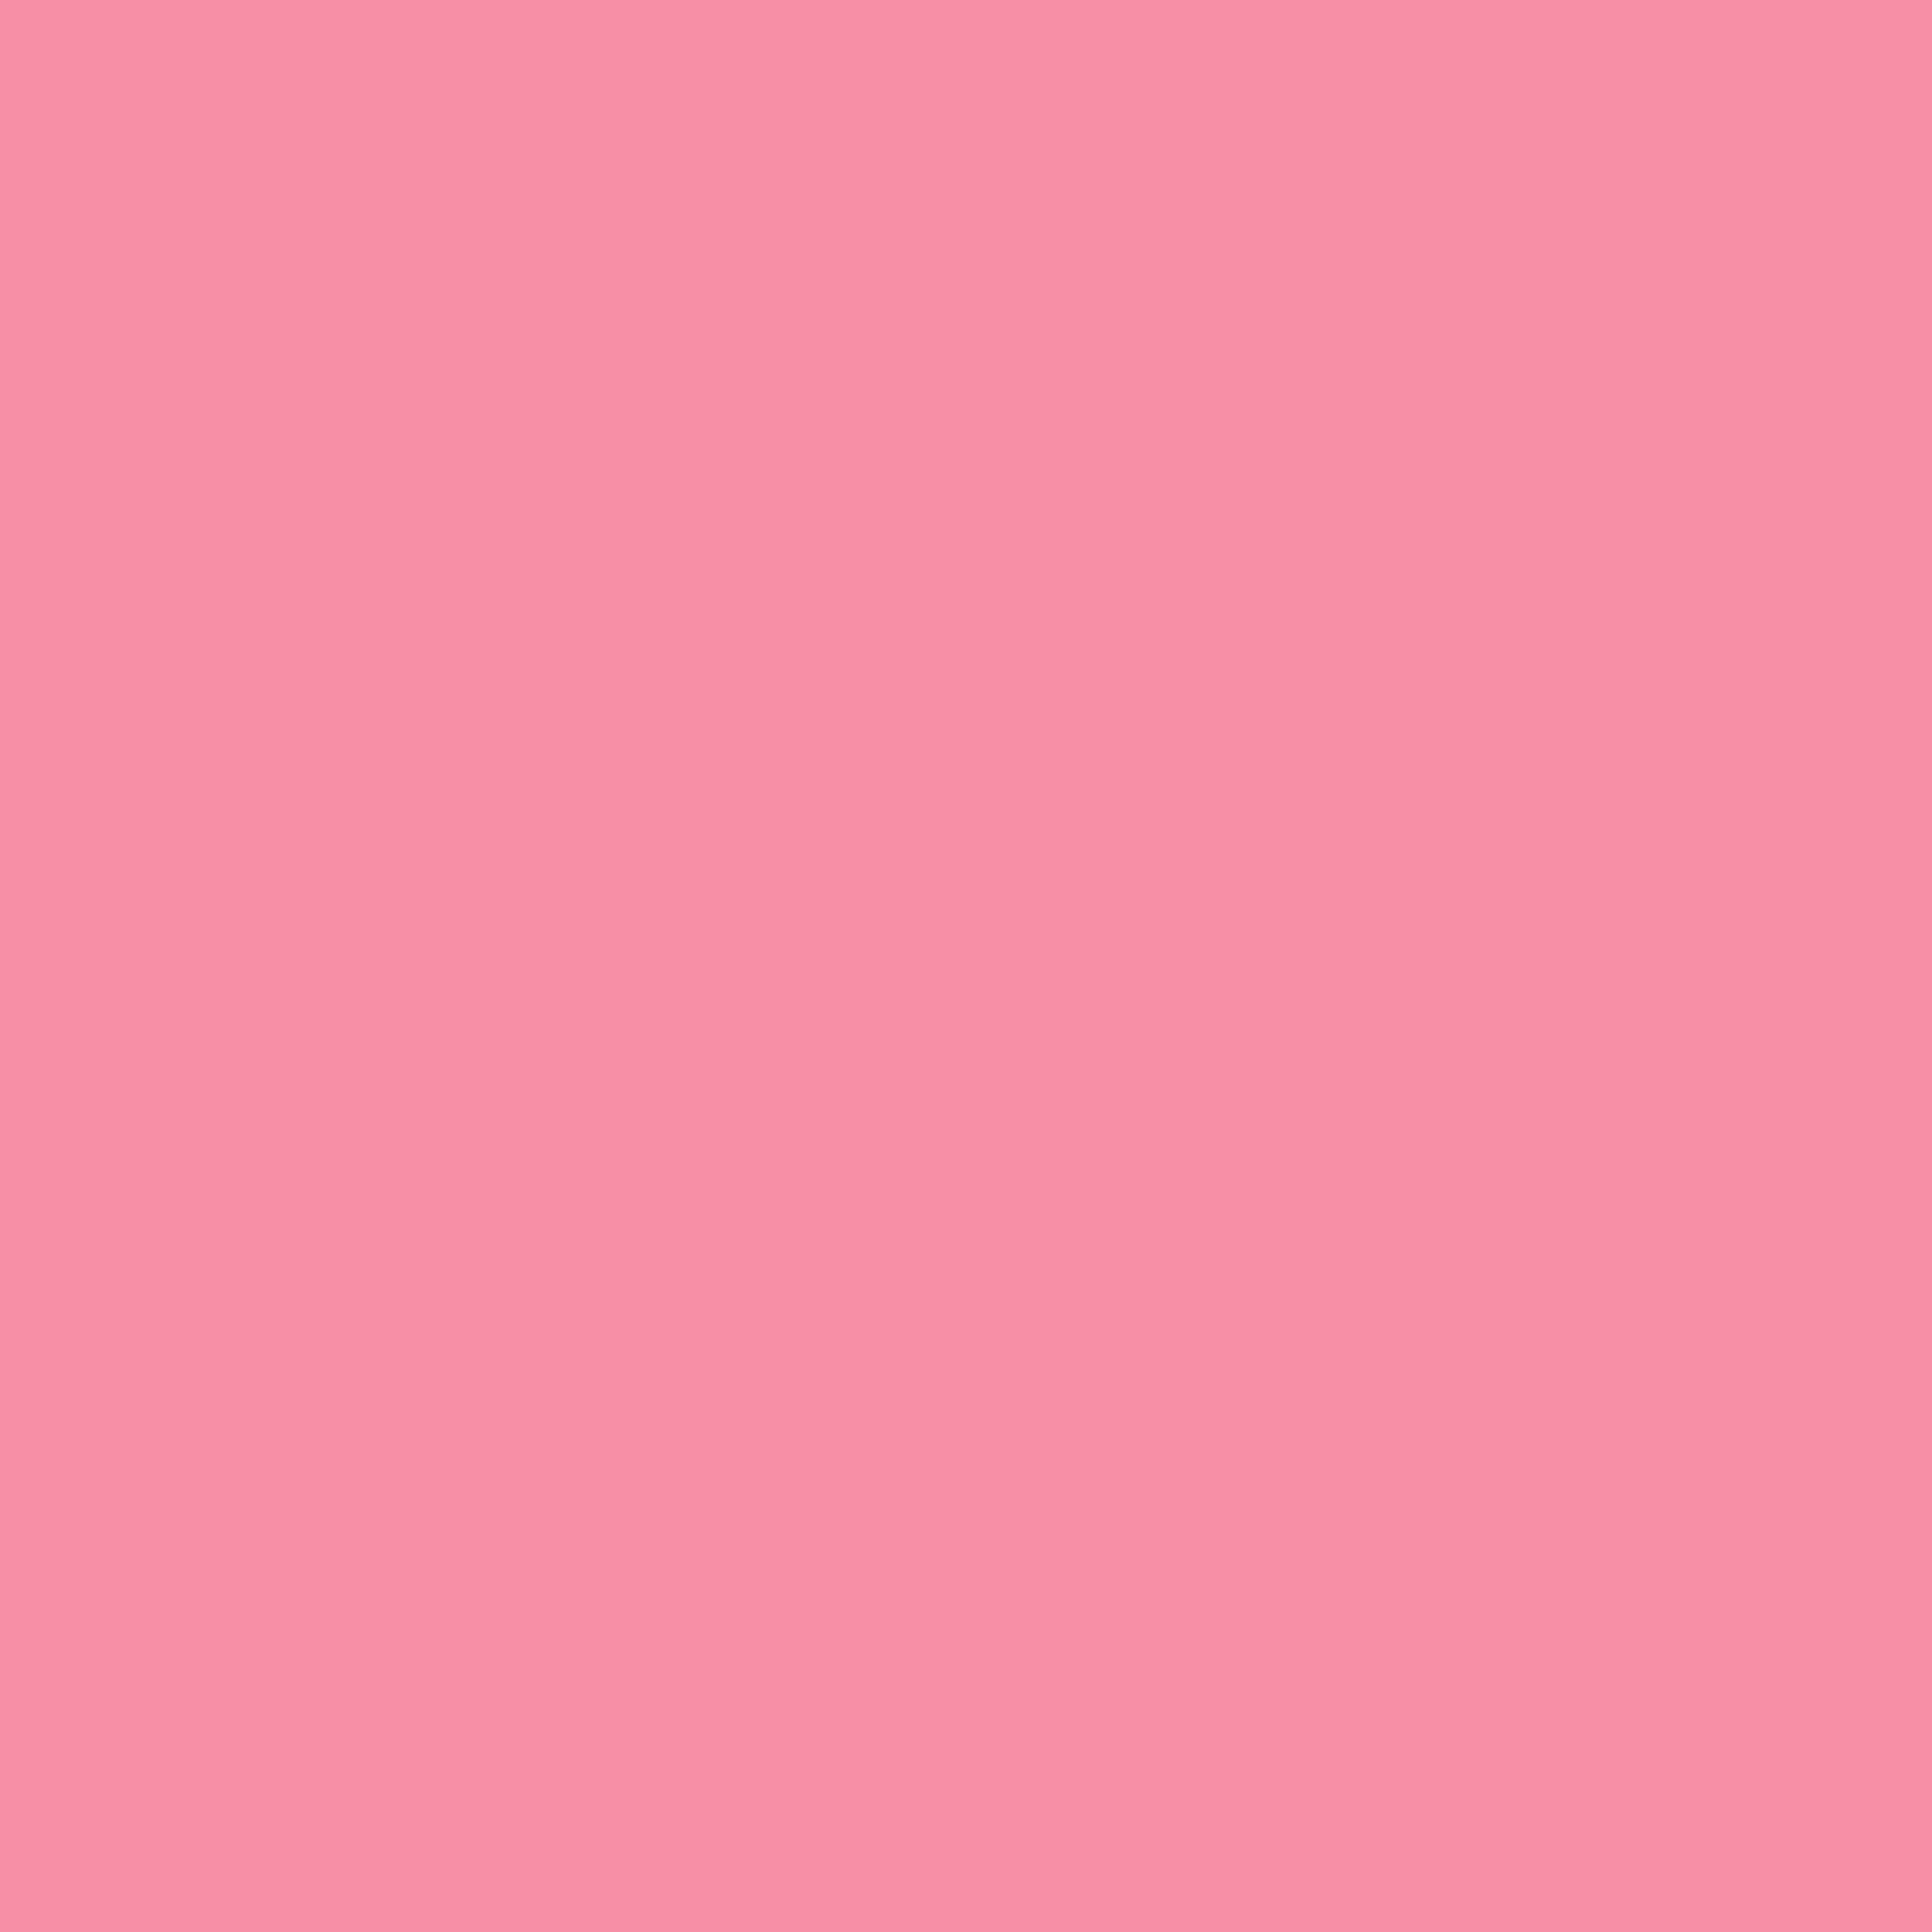 2048x2048 Pink Sherbet Solid Color Background